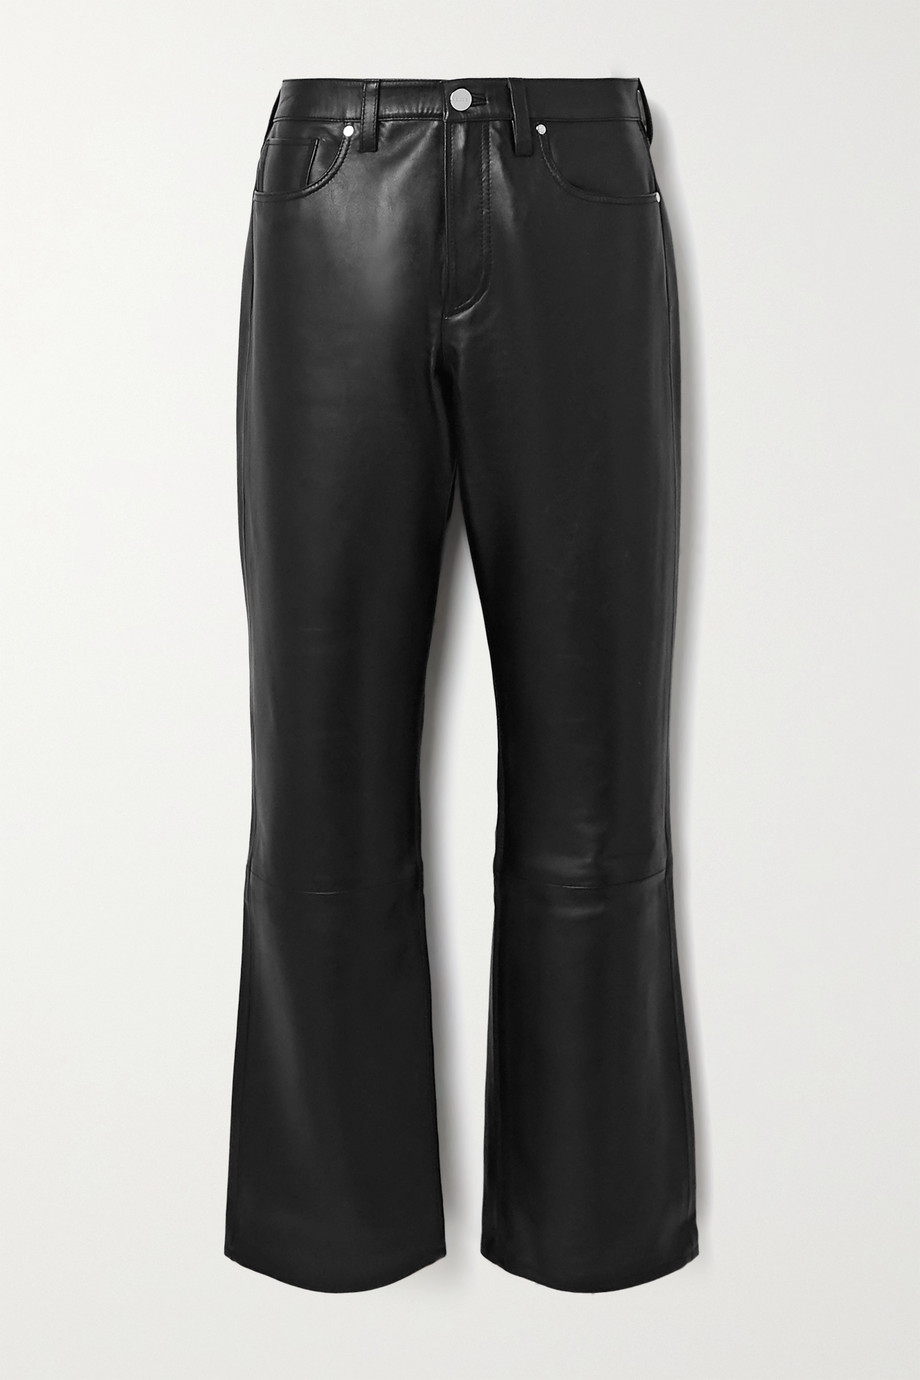 GOLDSIGN Nineties leather straight-leg pants